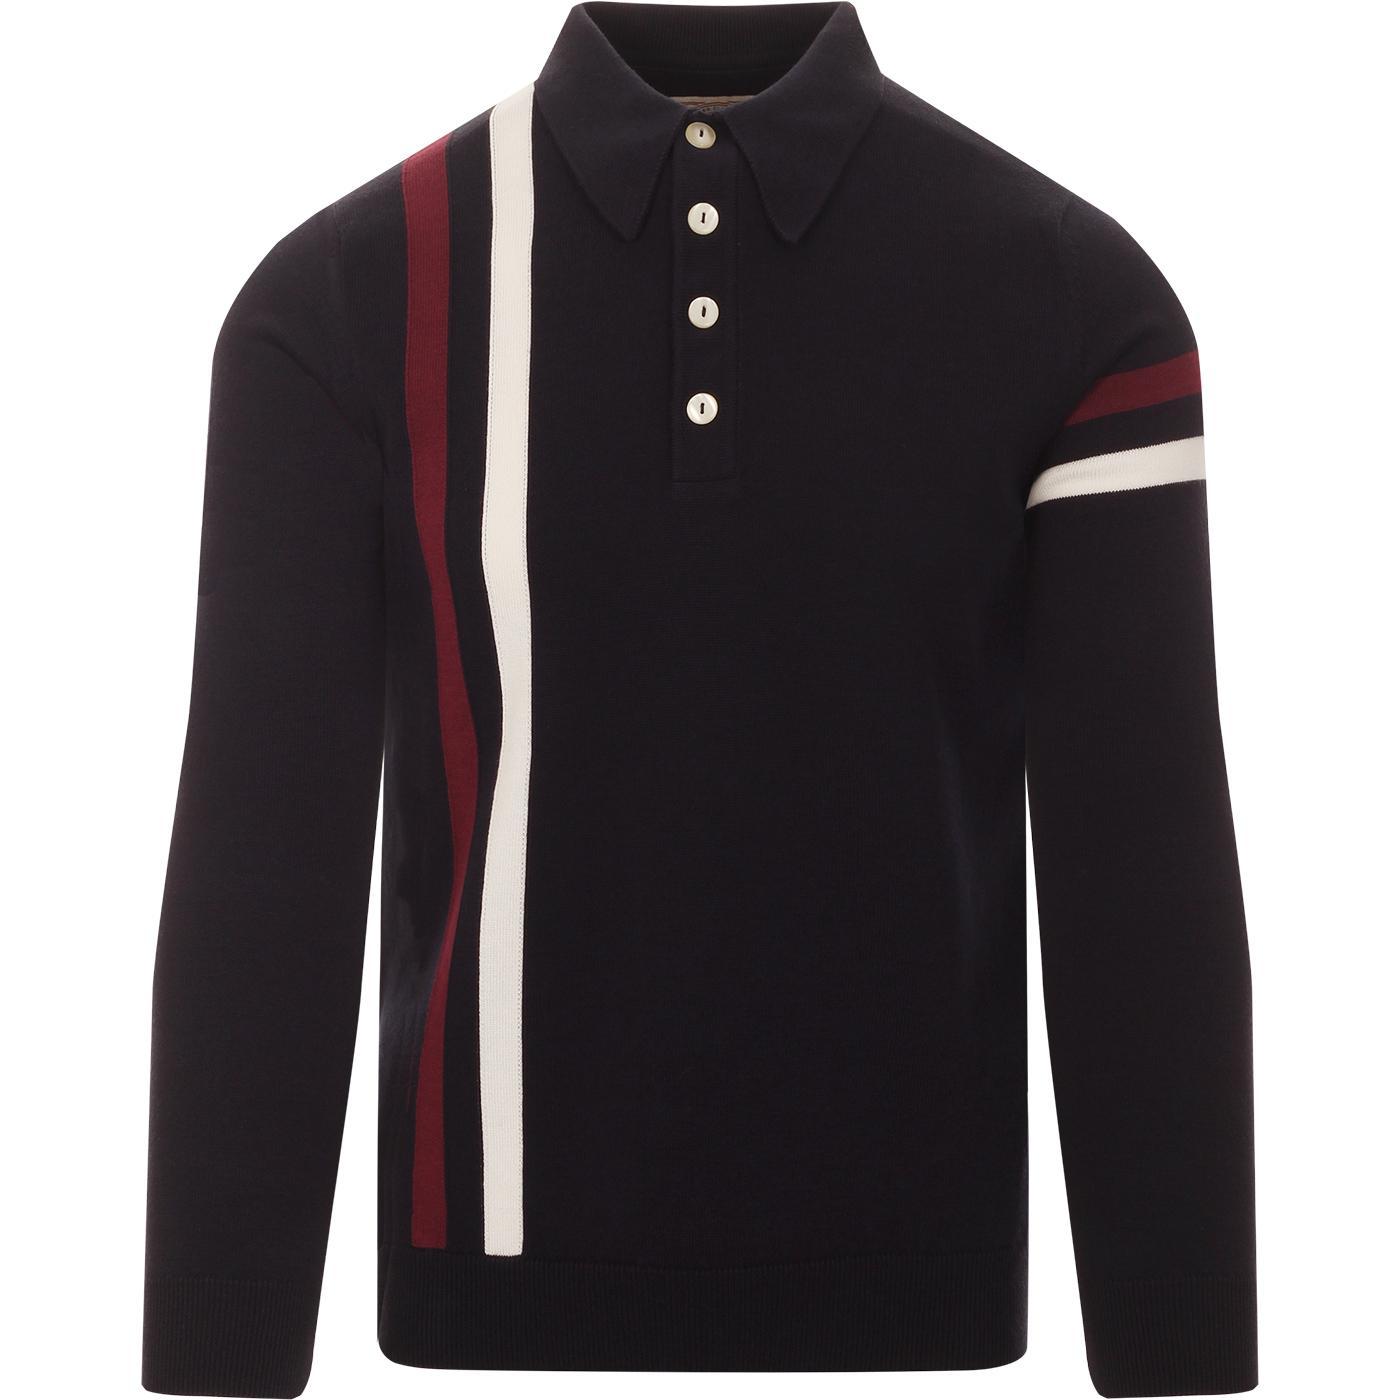 SKA & SOUL 60s Mod Racing Stripe Knit Polo Shirt N